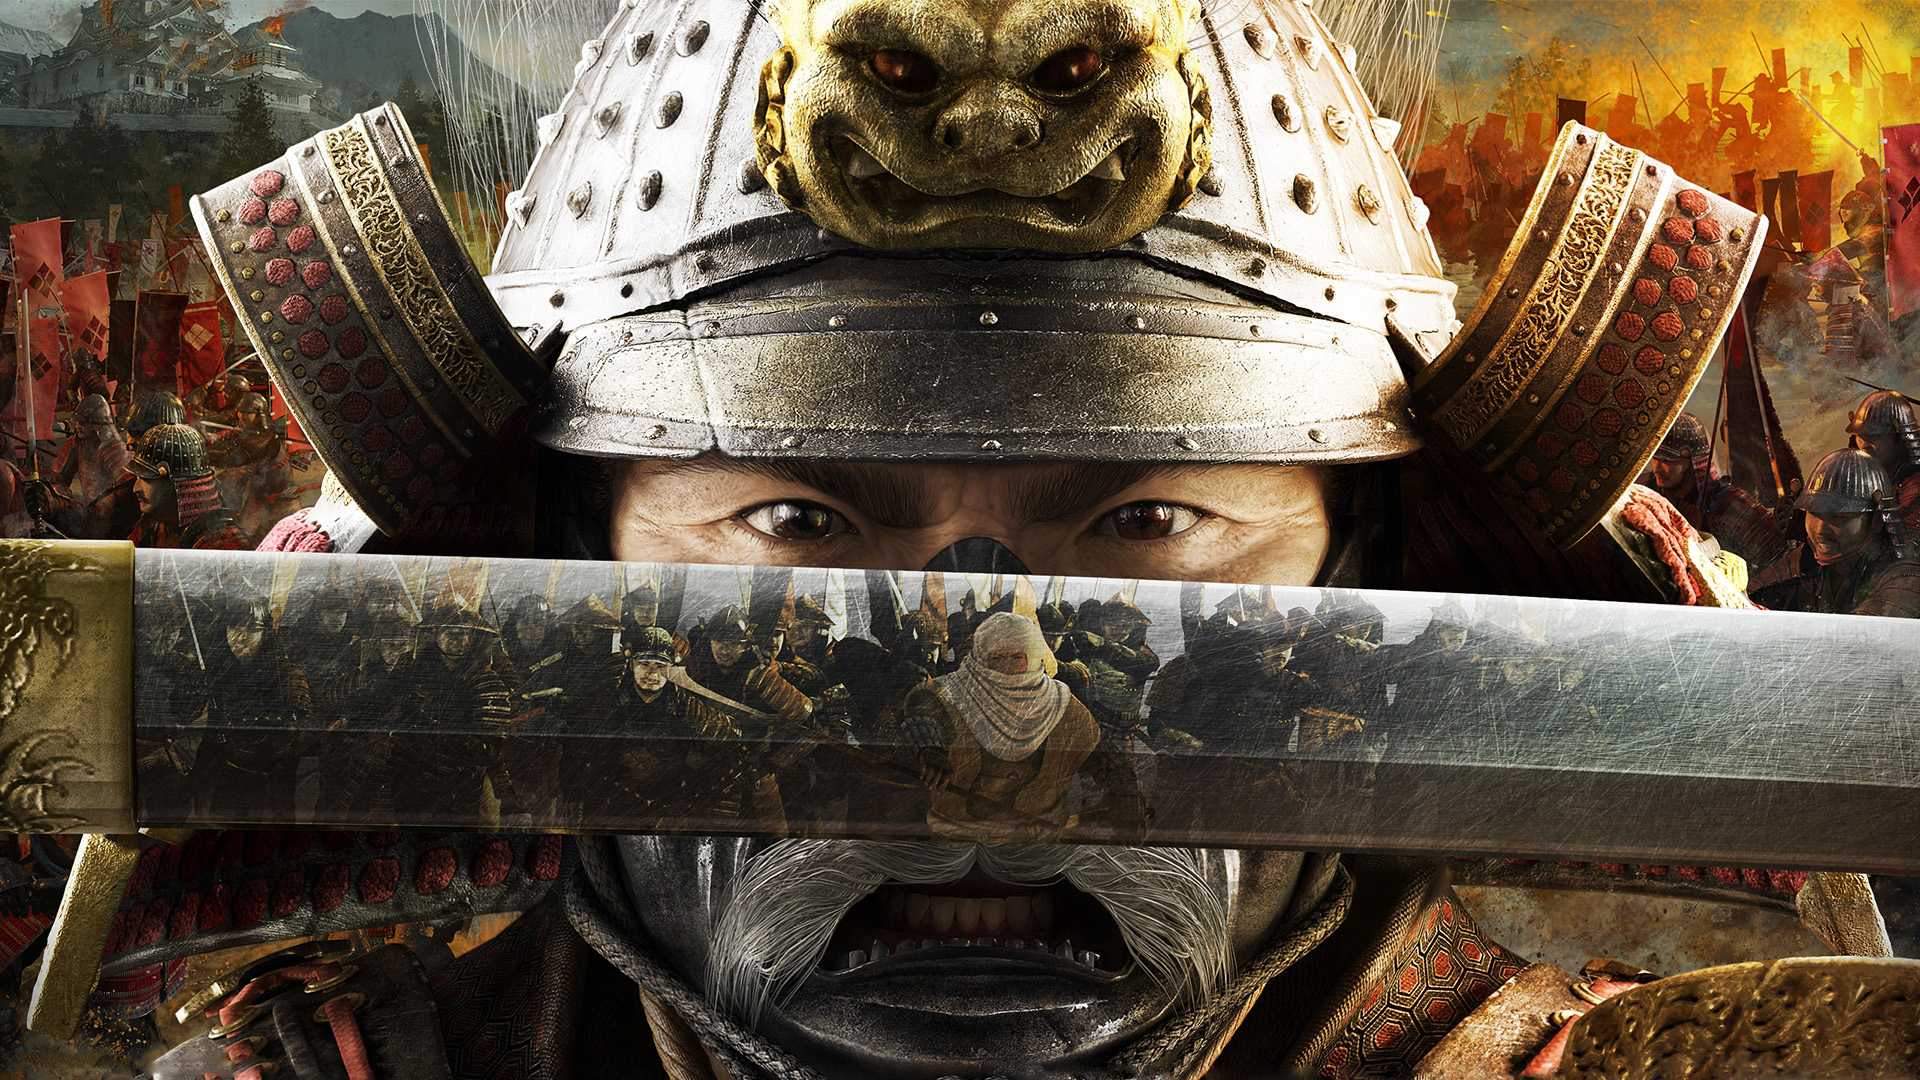 SHOGUN 2 TOTAL WAR WALLPAPER HD 1080P XBOX 360